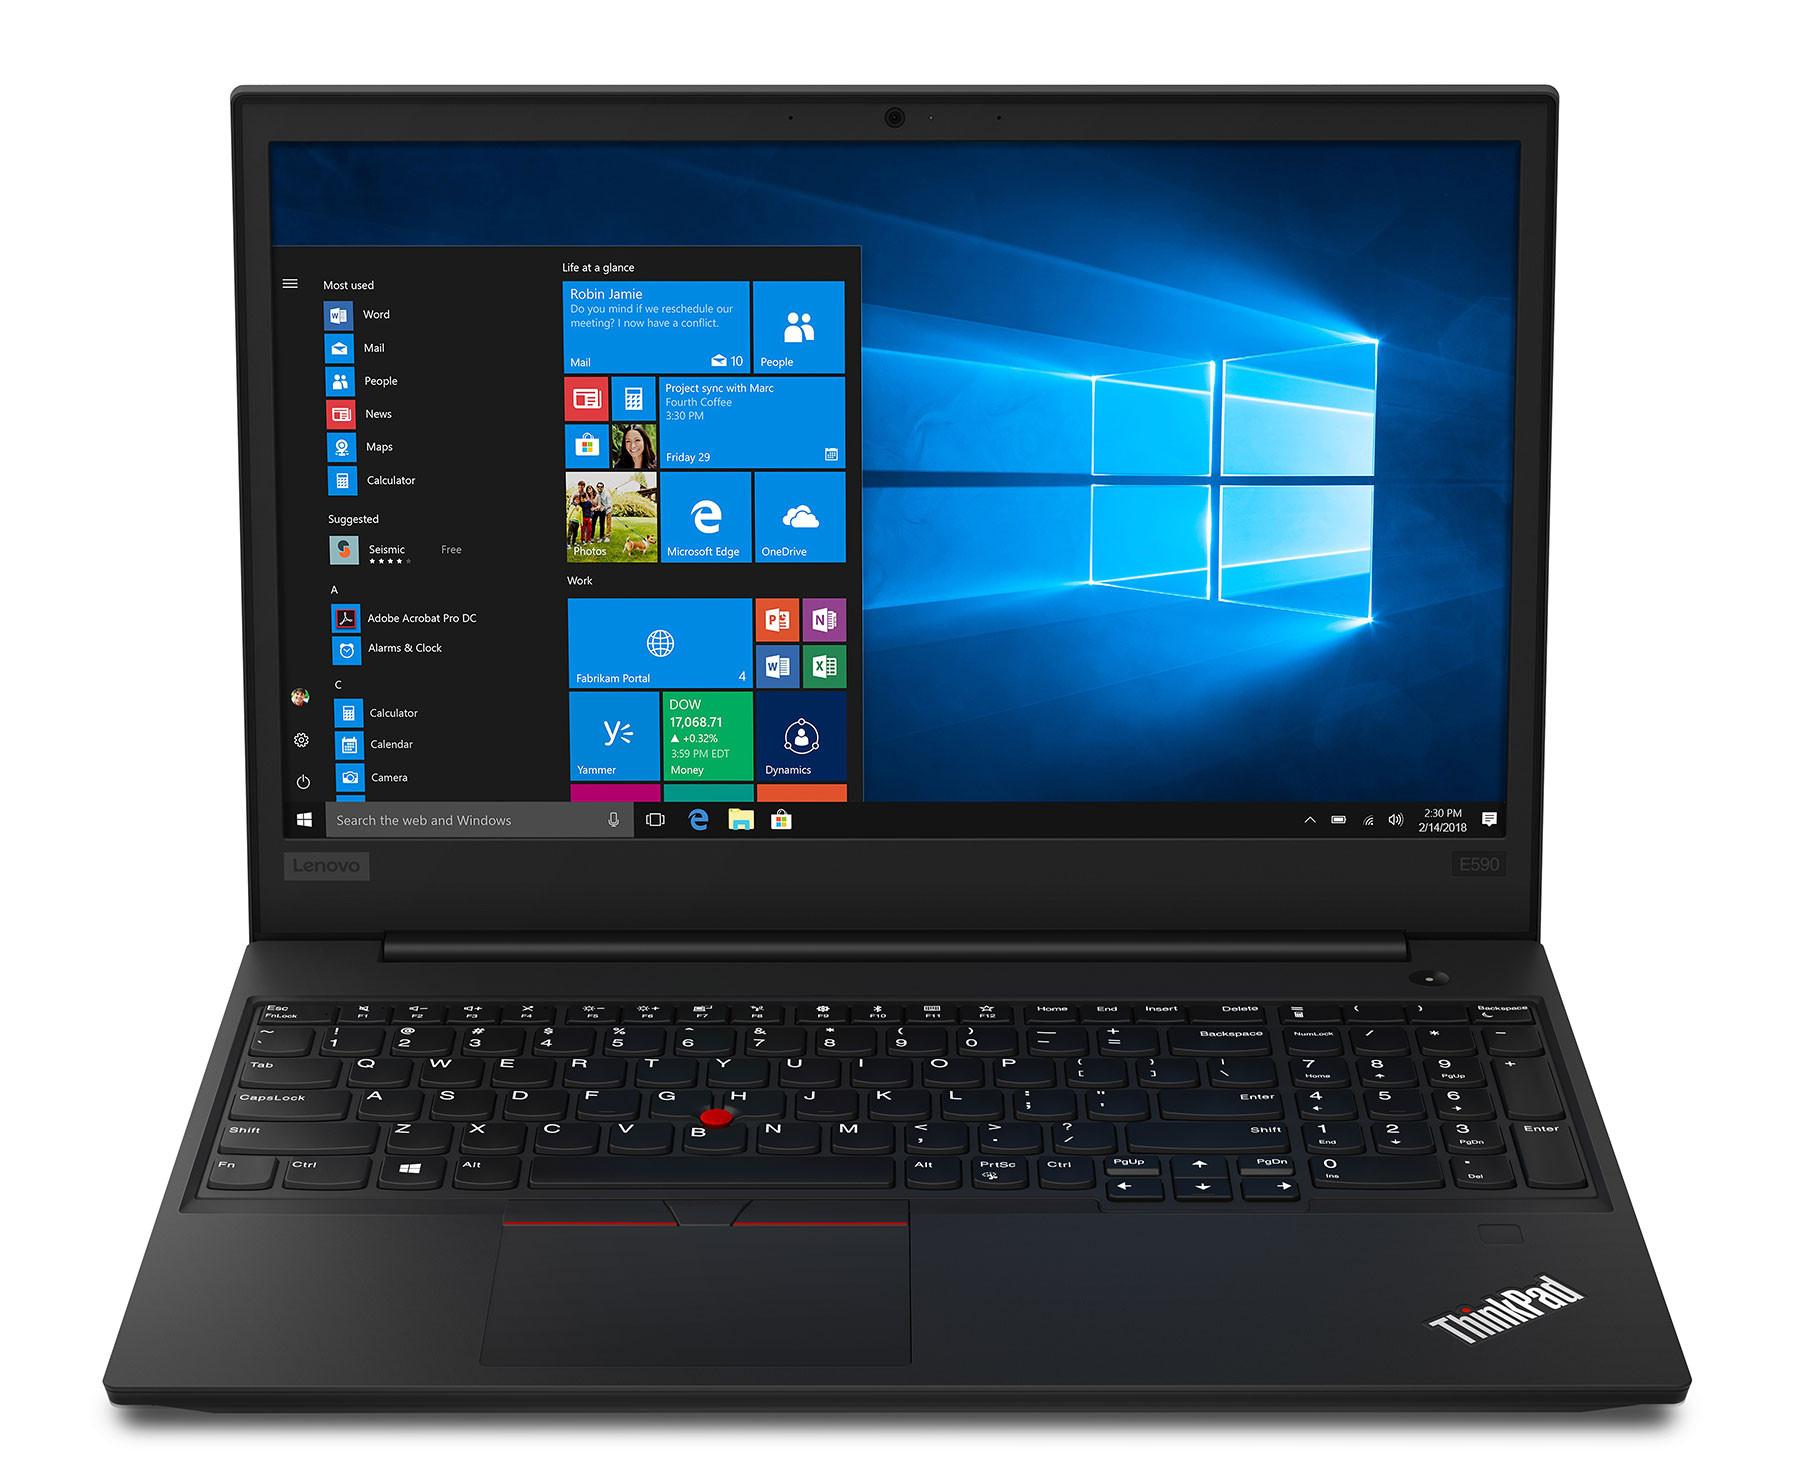 Lenovo ThinkPad E590 review – Whiskey Lake processors in